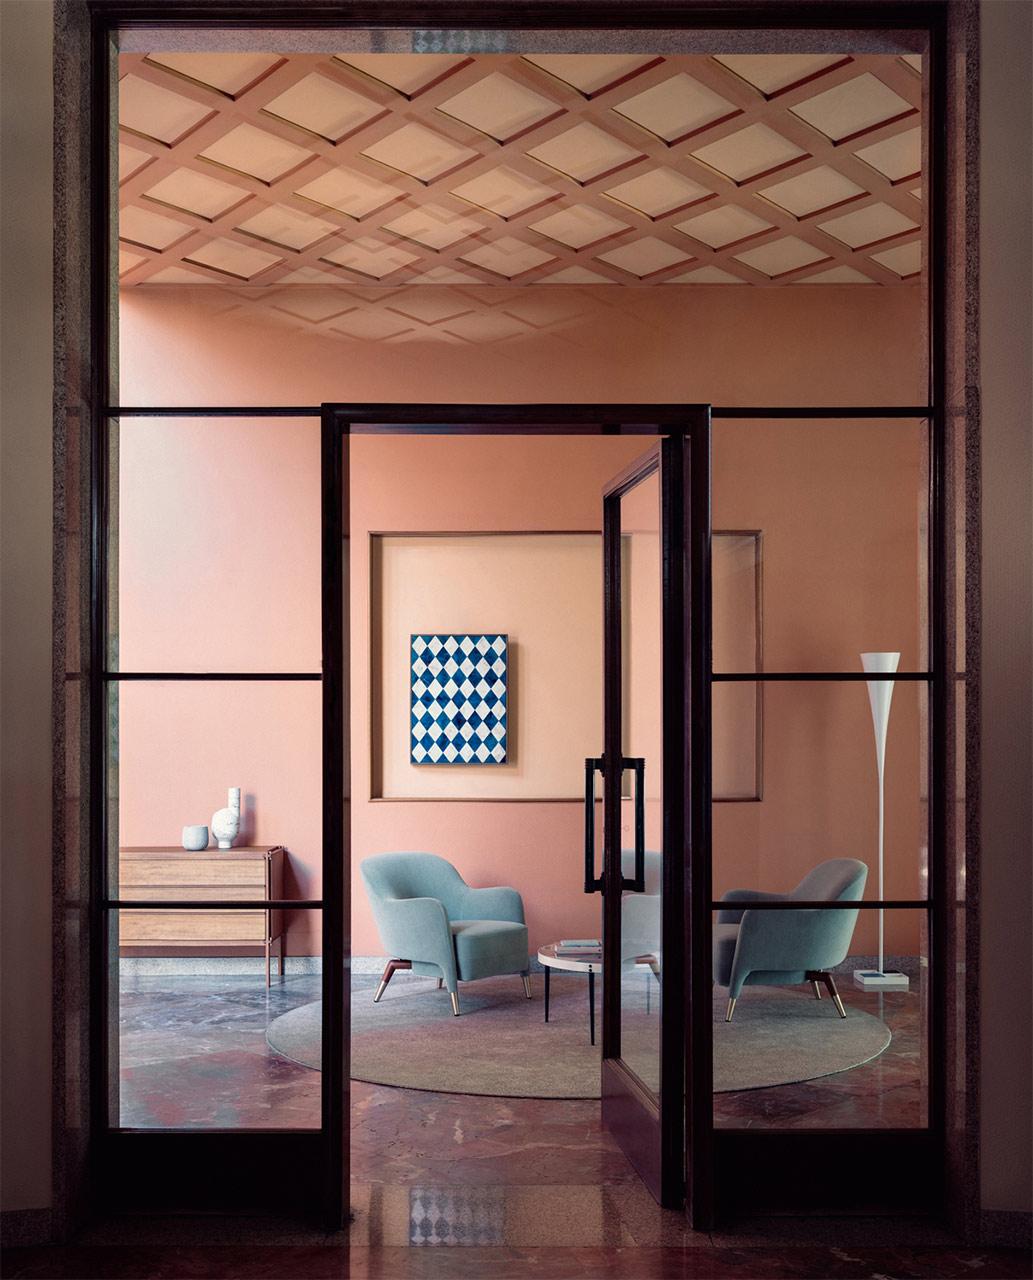 Molteni & C - Arredo Staff Agency - Italian Design Furniture - Molteni & C, Dada, Veneta Cucine